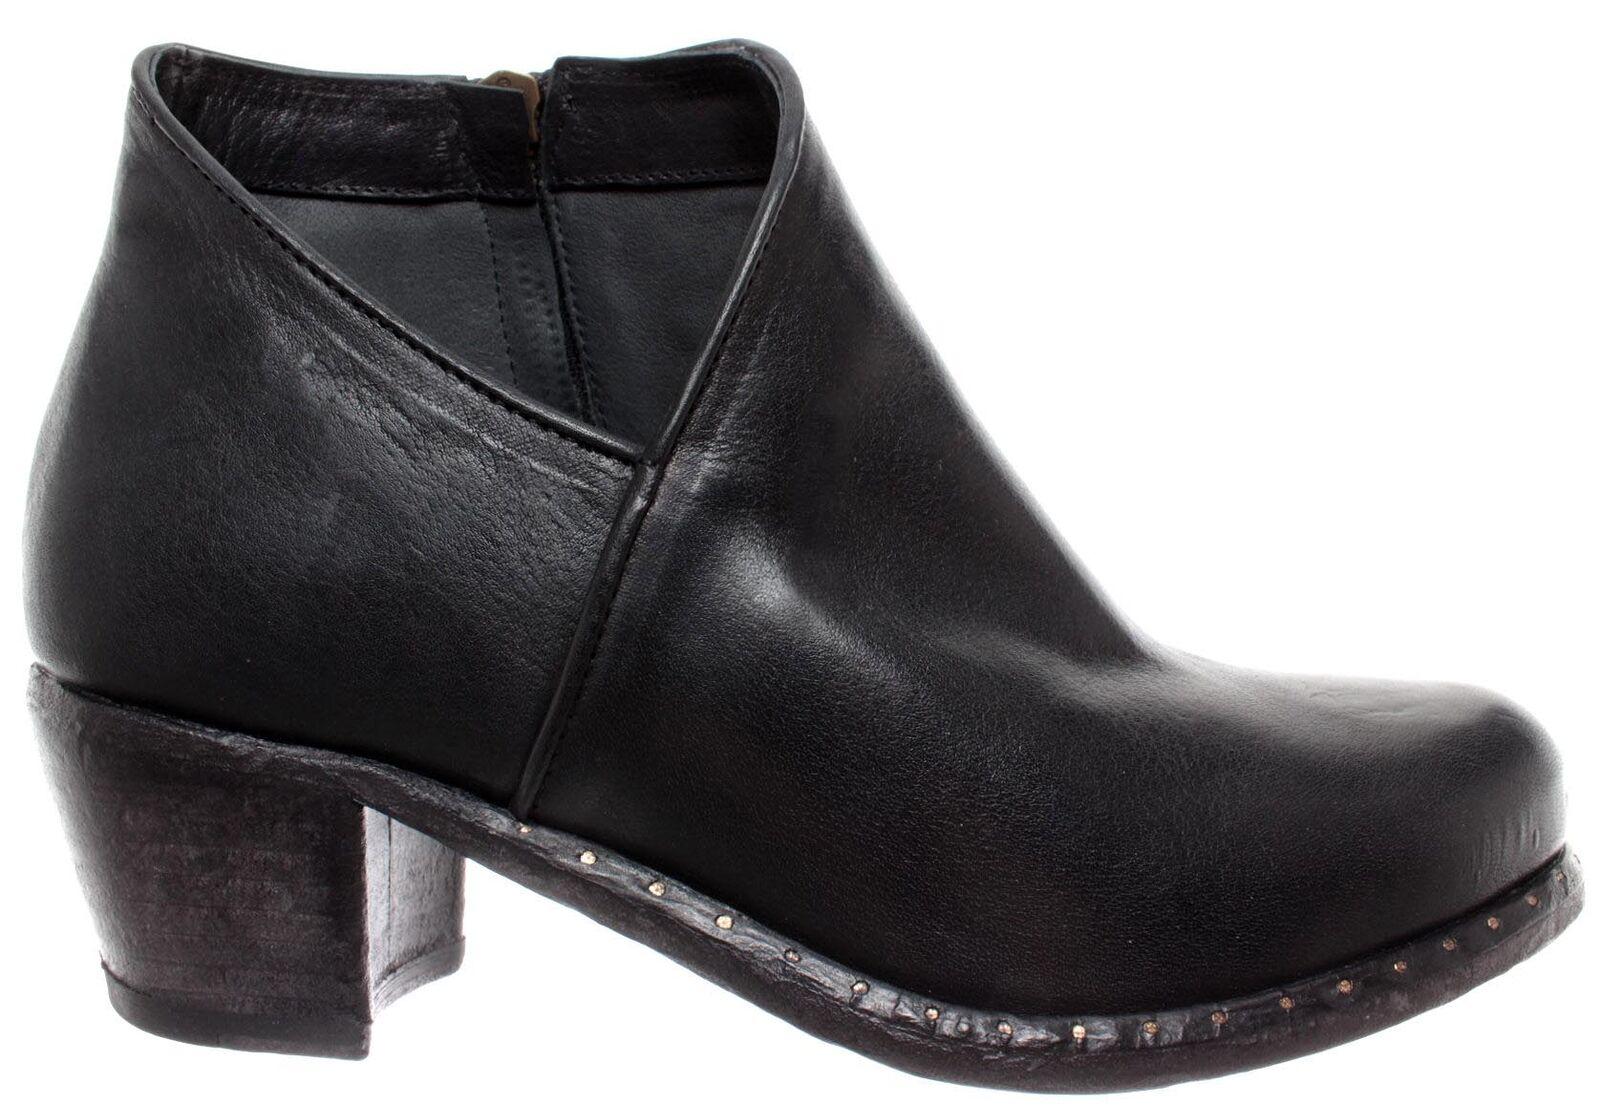 Fiorentini Fiorentini Fiorentini + Baker Chaussures Femmes Bottines Bala-G9 Cuir Noir Fermeture Éclair Neuf d9840f